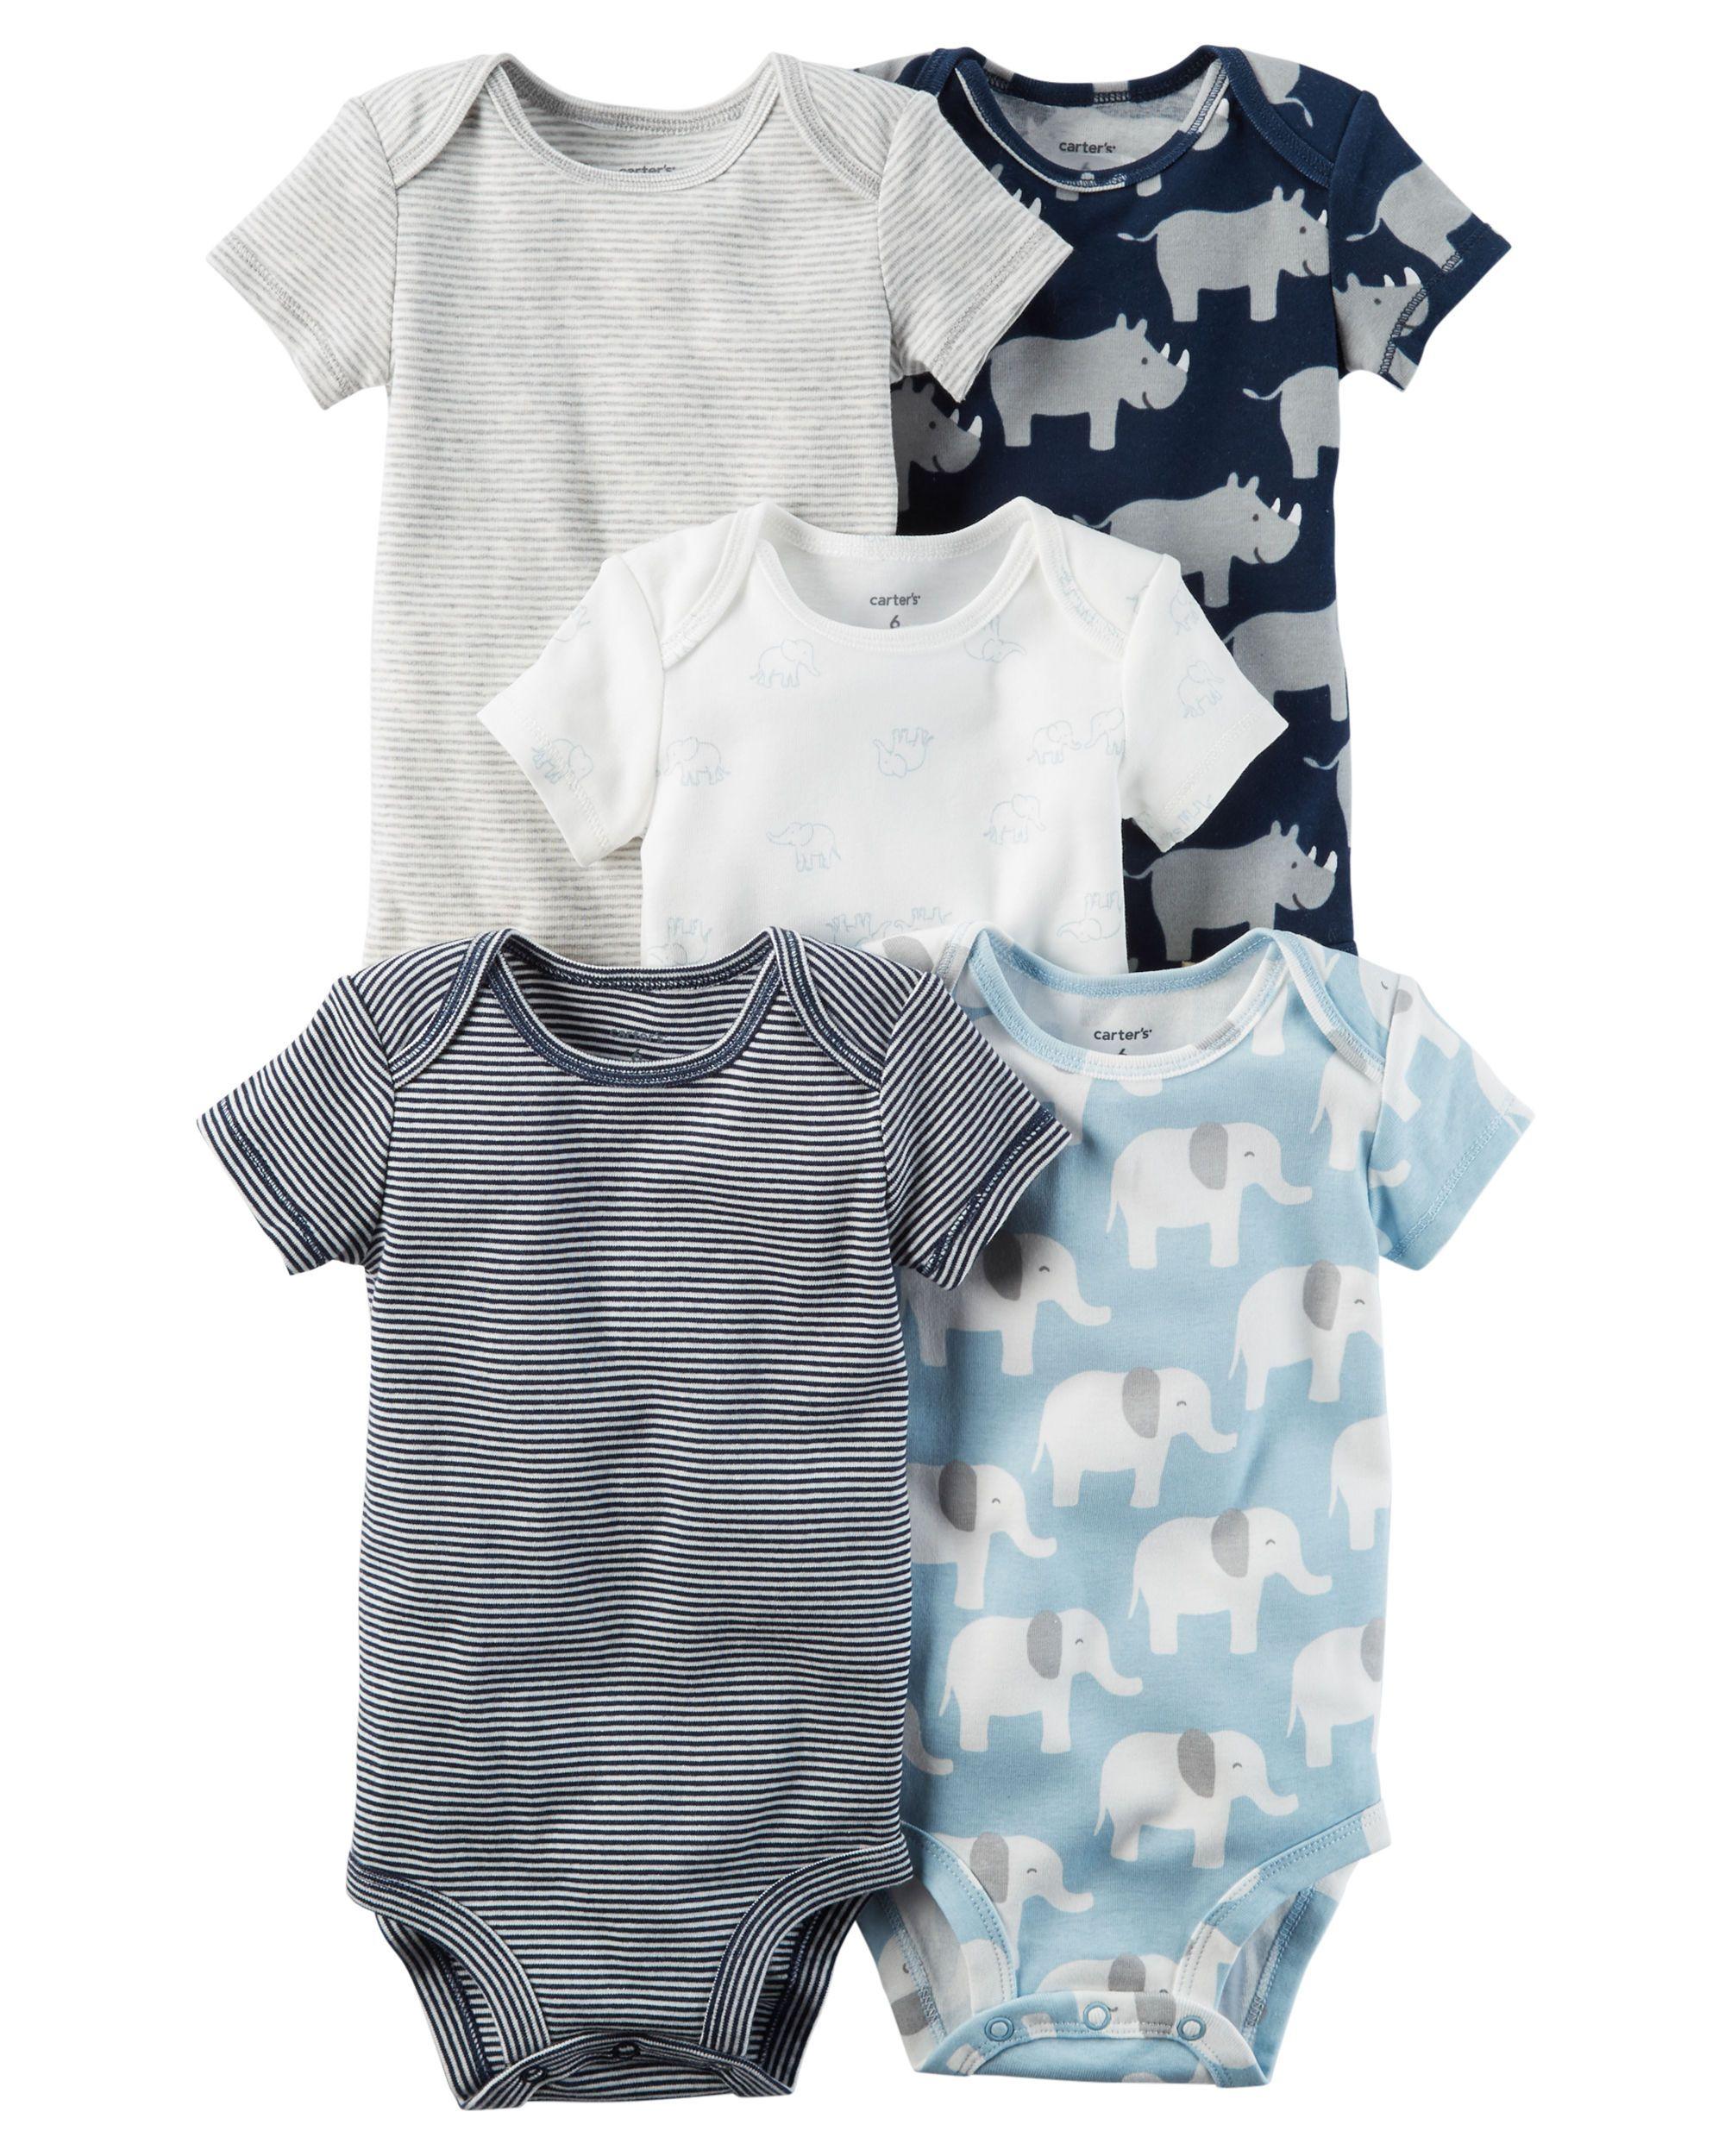 223d5cc90 Image result for Baby Boy Carter's 5-pk. Short Sleeve Elephant & Rhino  Bodysuits